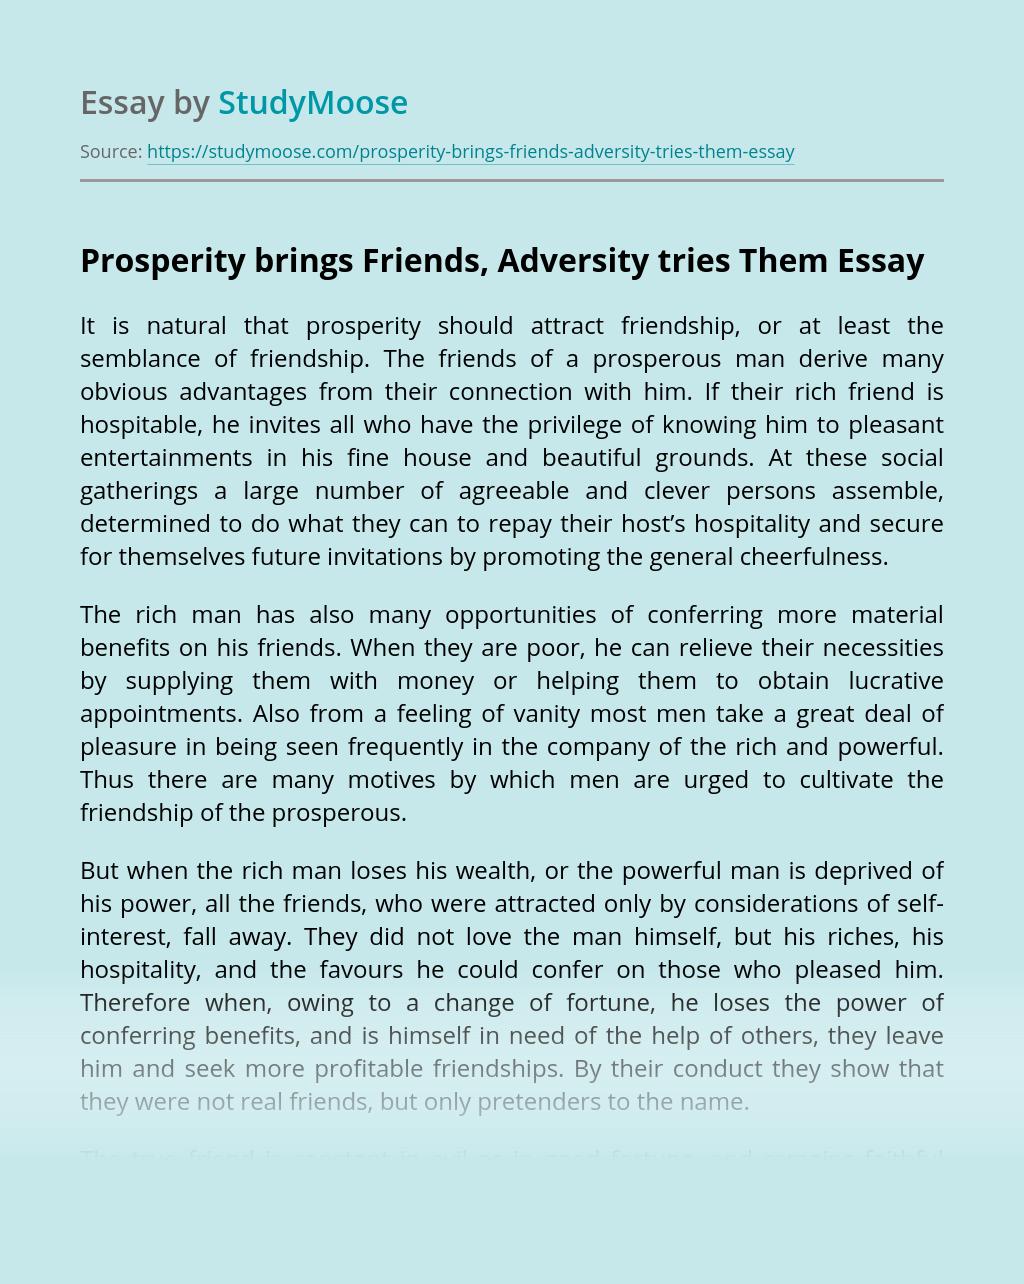 Prosperity brings Friends, Adversity tries Them